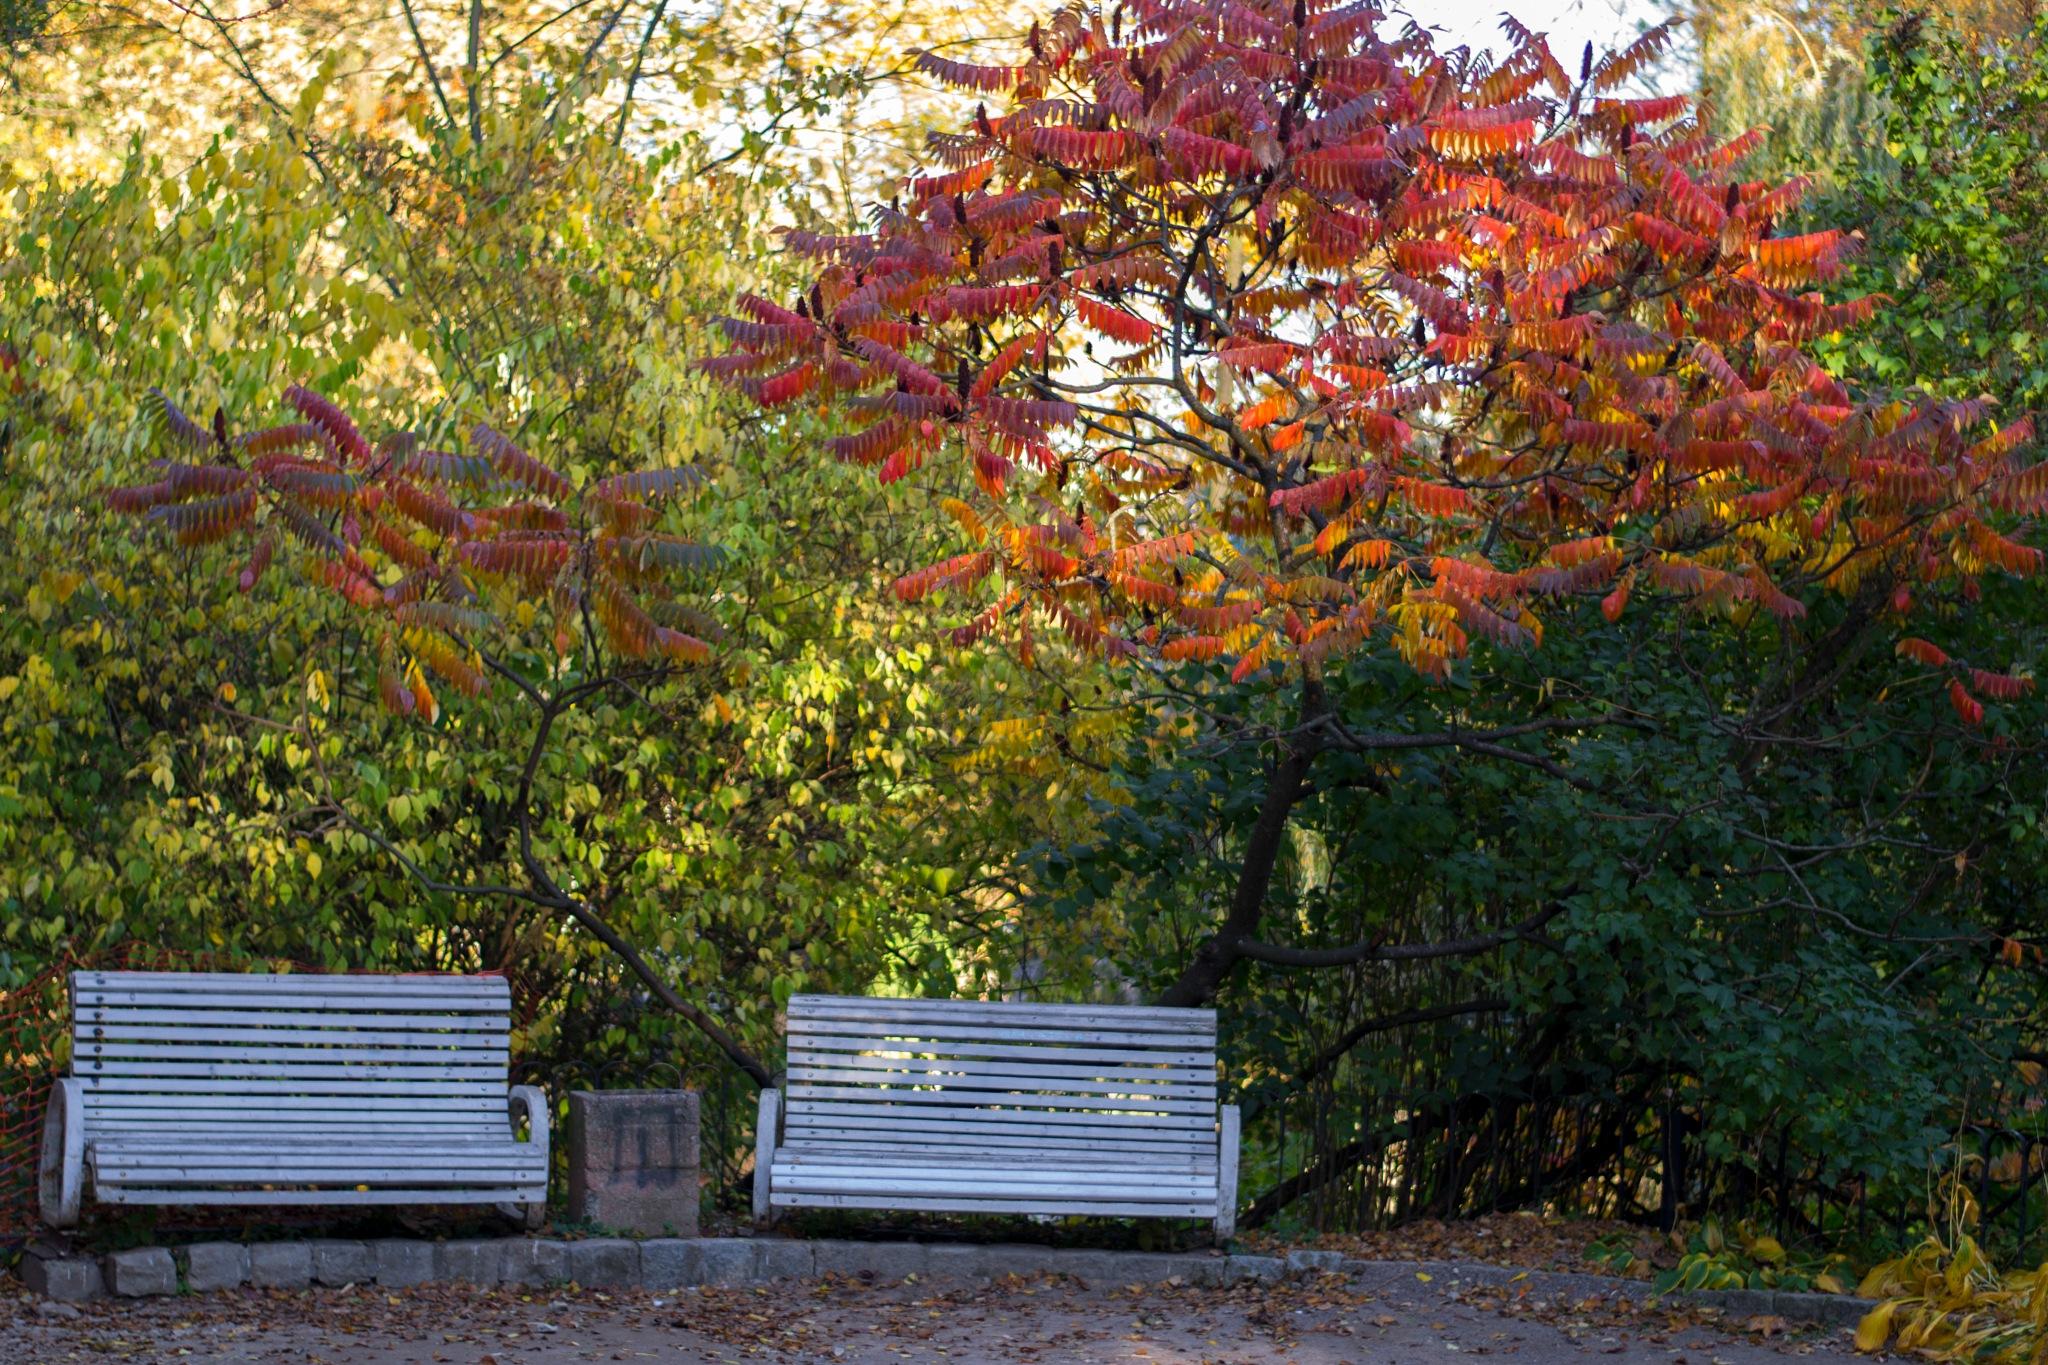 Autumn by Roman Borshovskyy